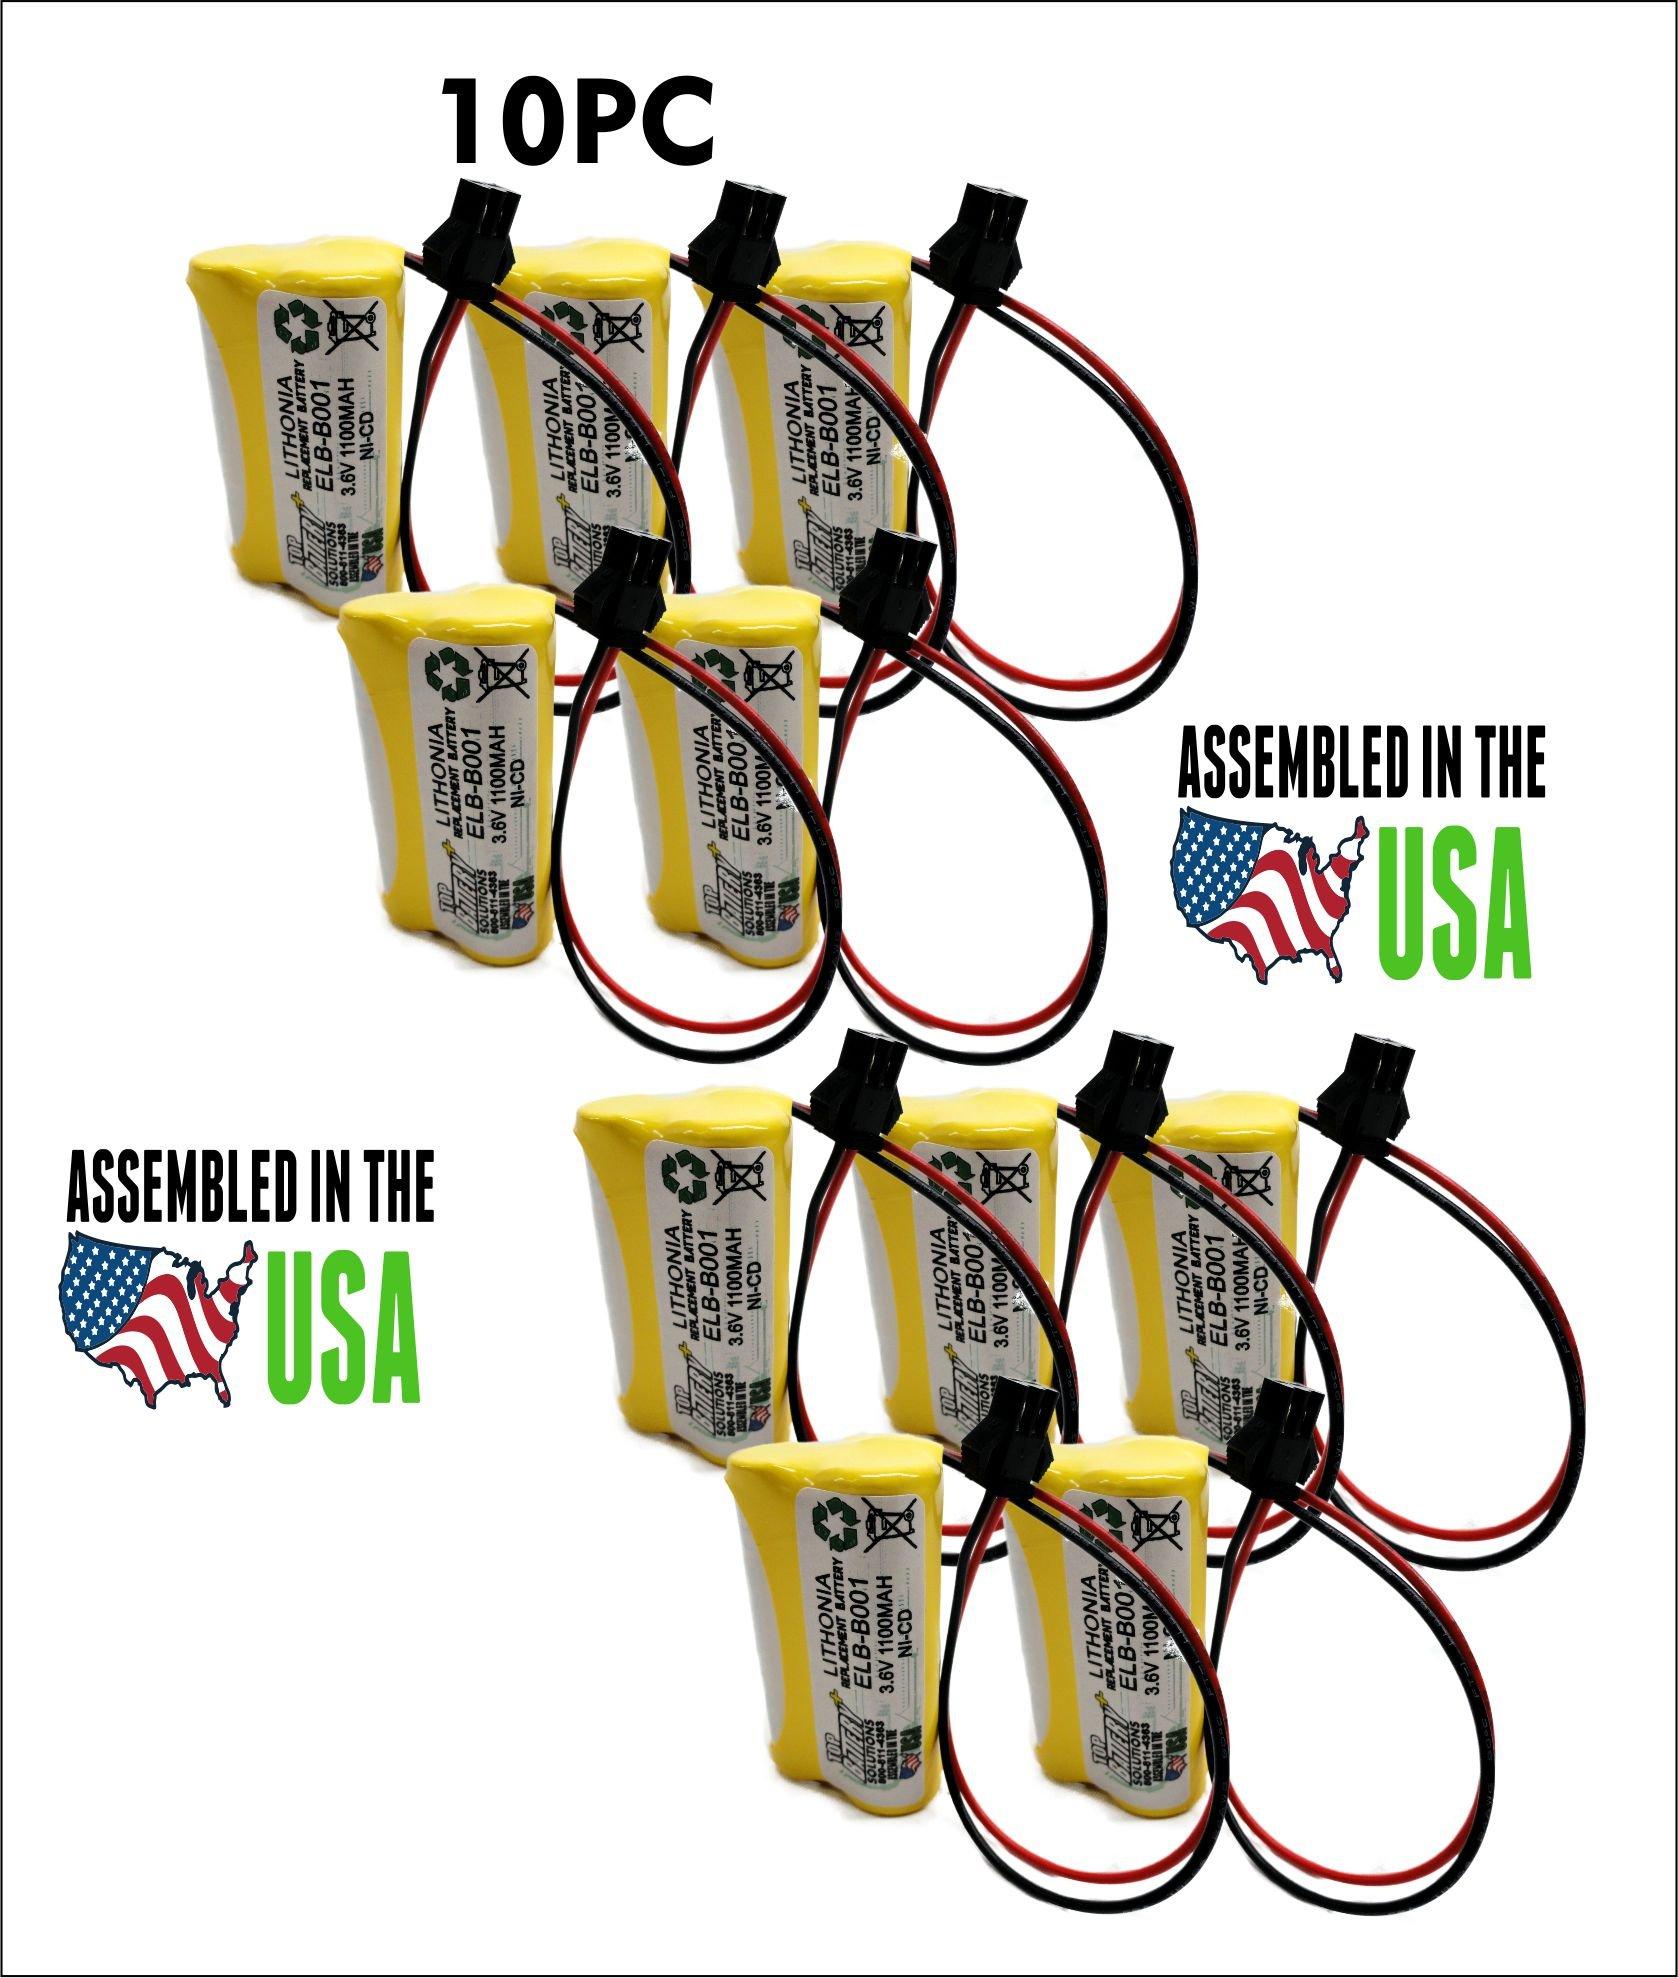 10PC Lithonia ELB-B001,ELBB001 Replacement Emergency Light Battery